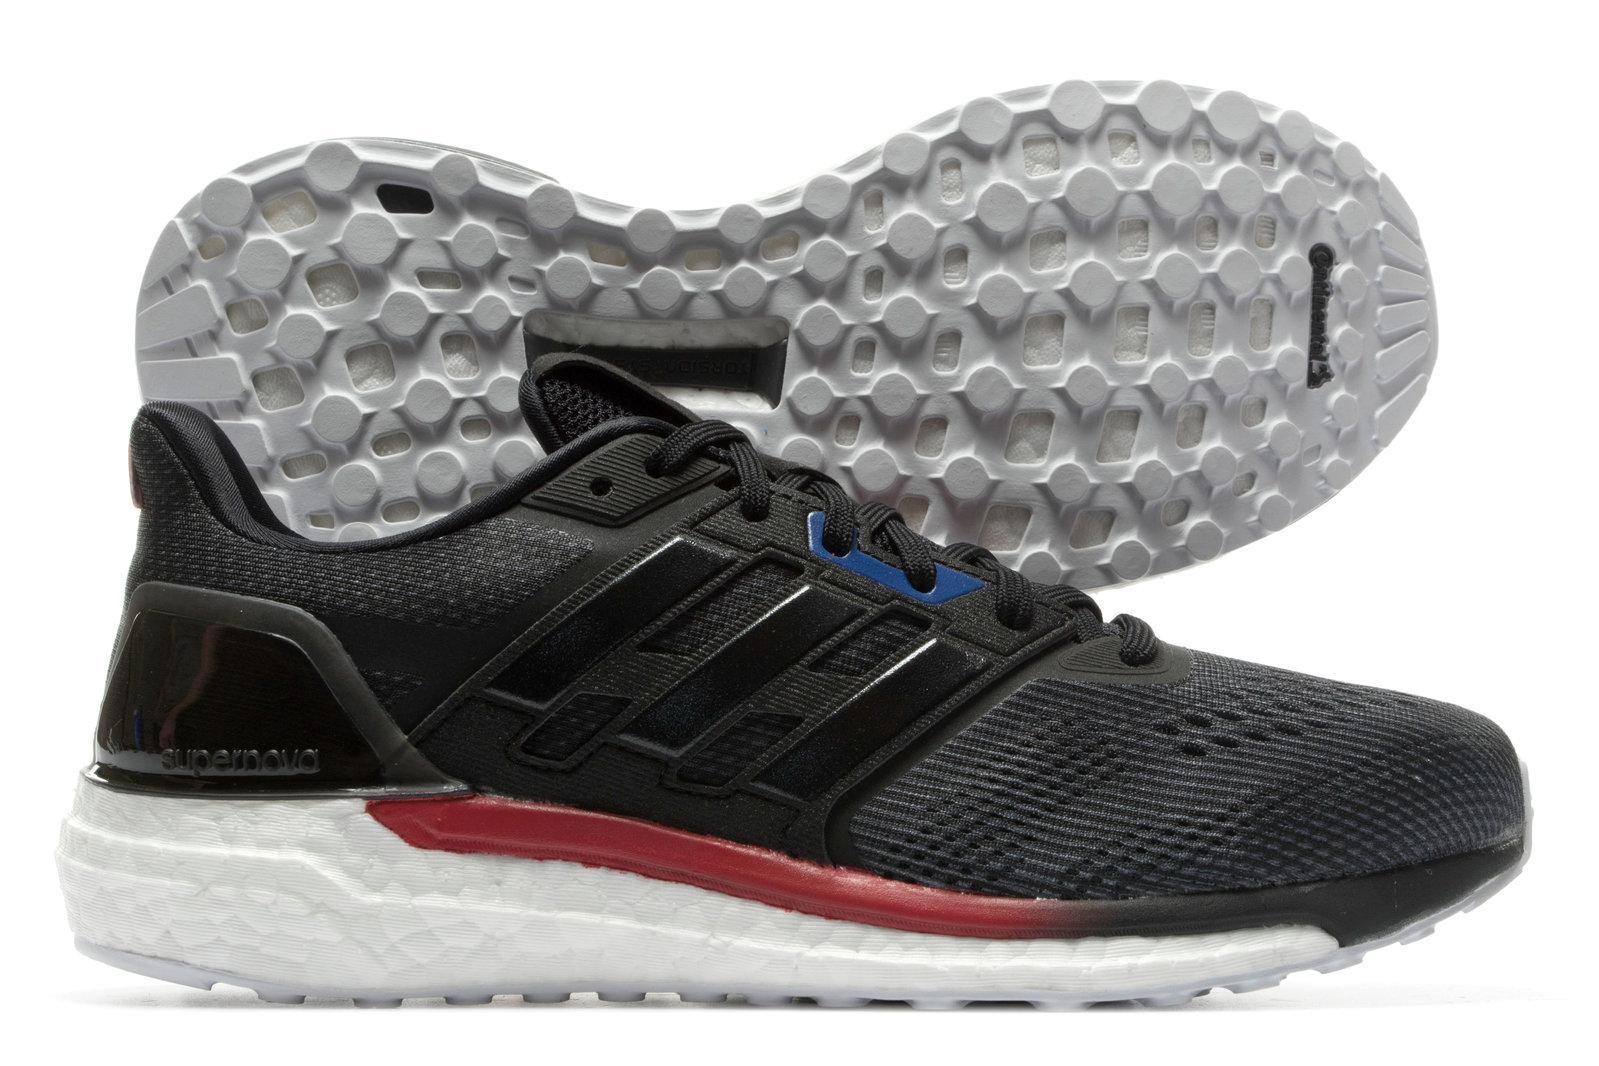 quality design 8fc76 7ed9f adidas Mens Supernova AKTIV Running Shoes Footwear Sports Trainers Black